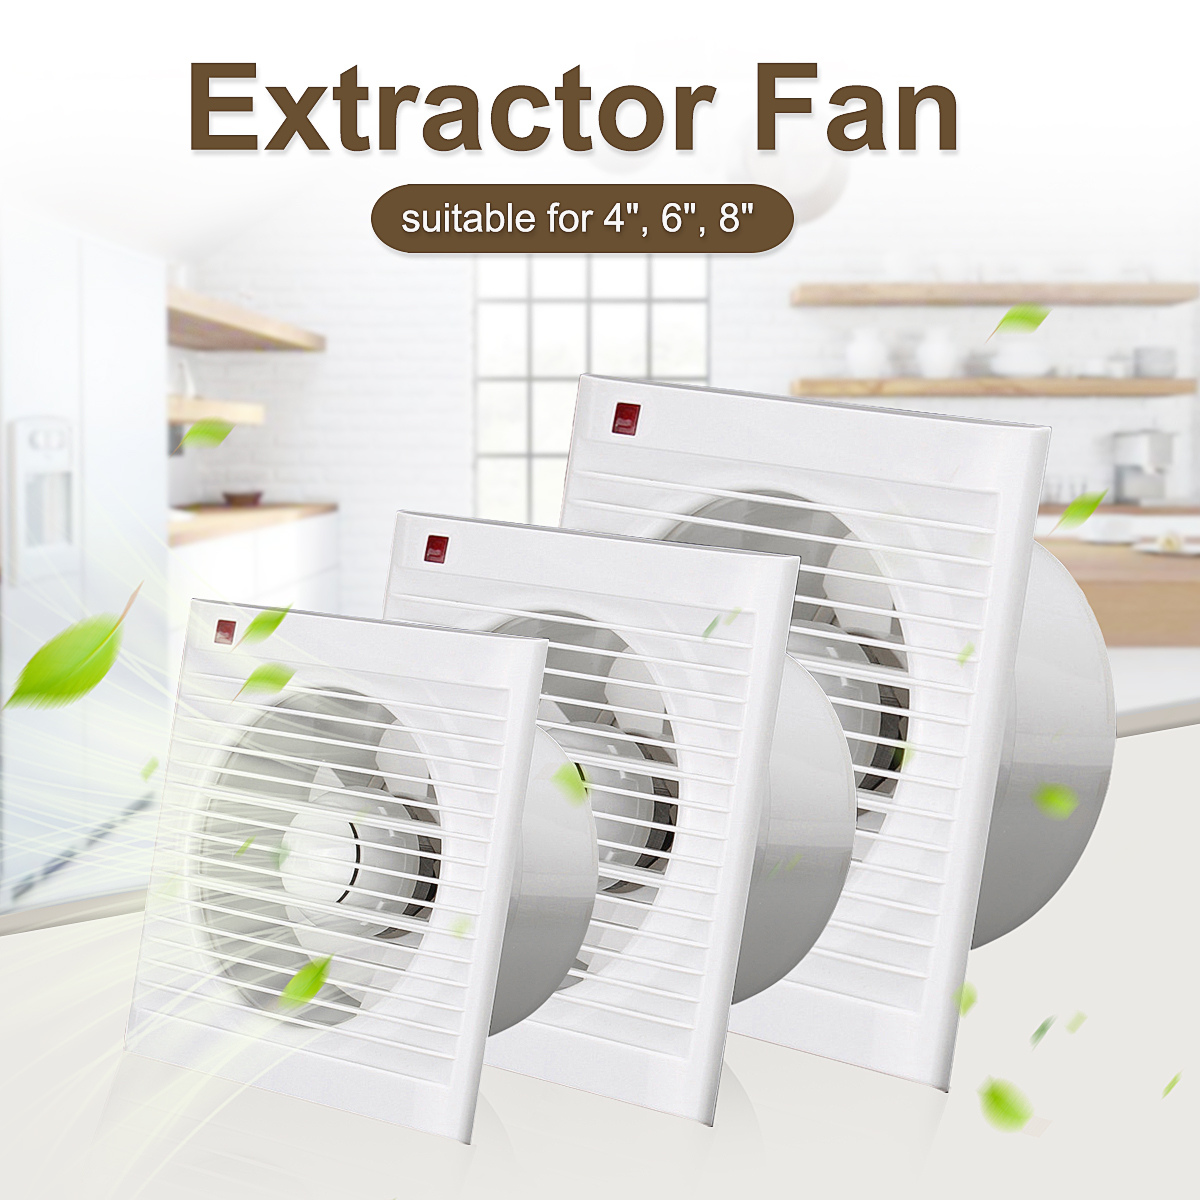 220v 4 inch high speed exhaust fan ventilation extractor blower kitchen bathroom air vent fan